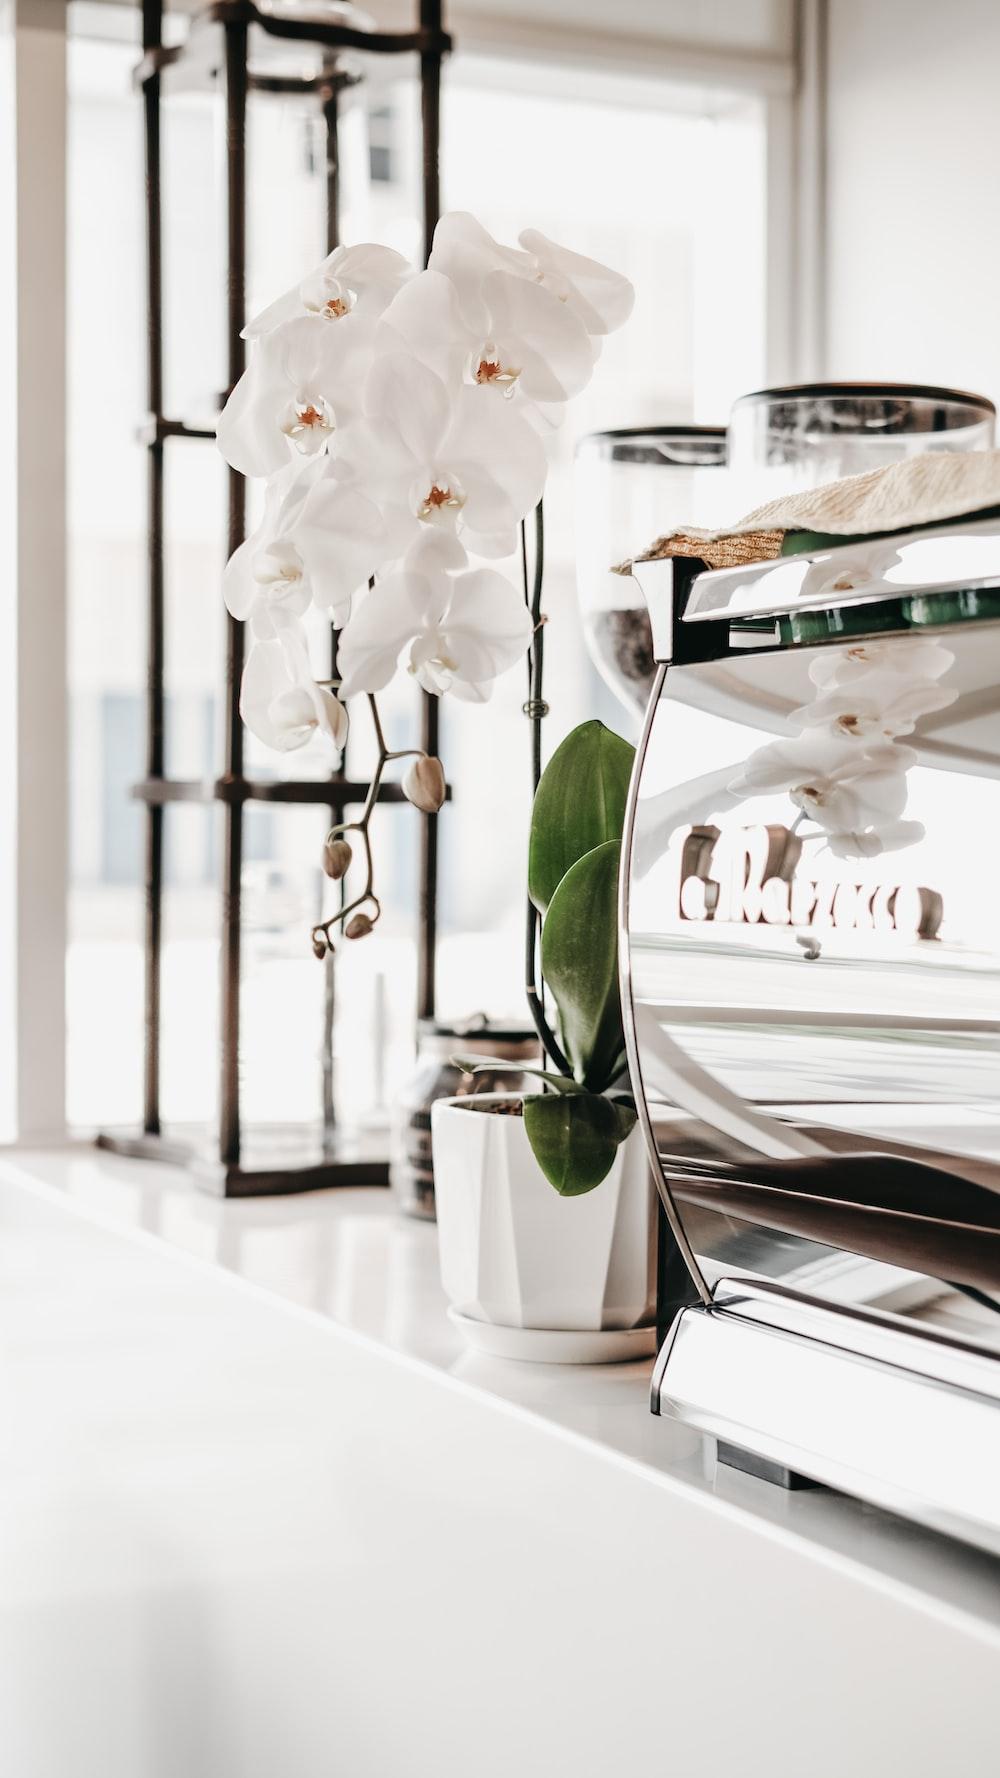 white moth orchids in white ceramic vase on table